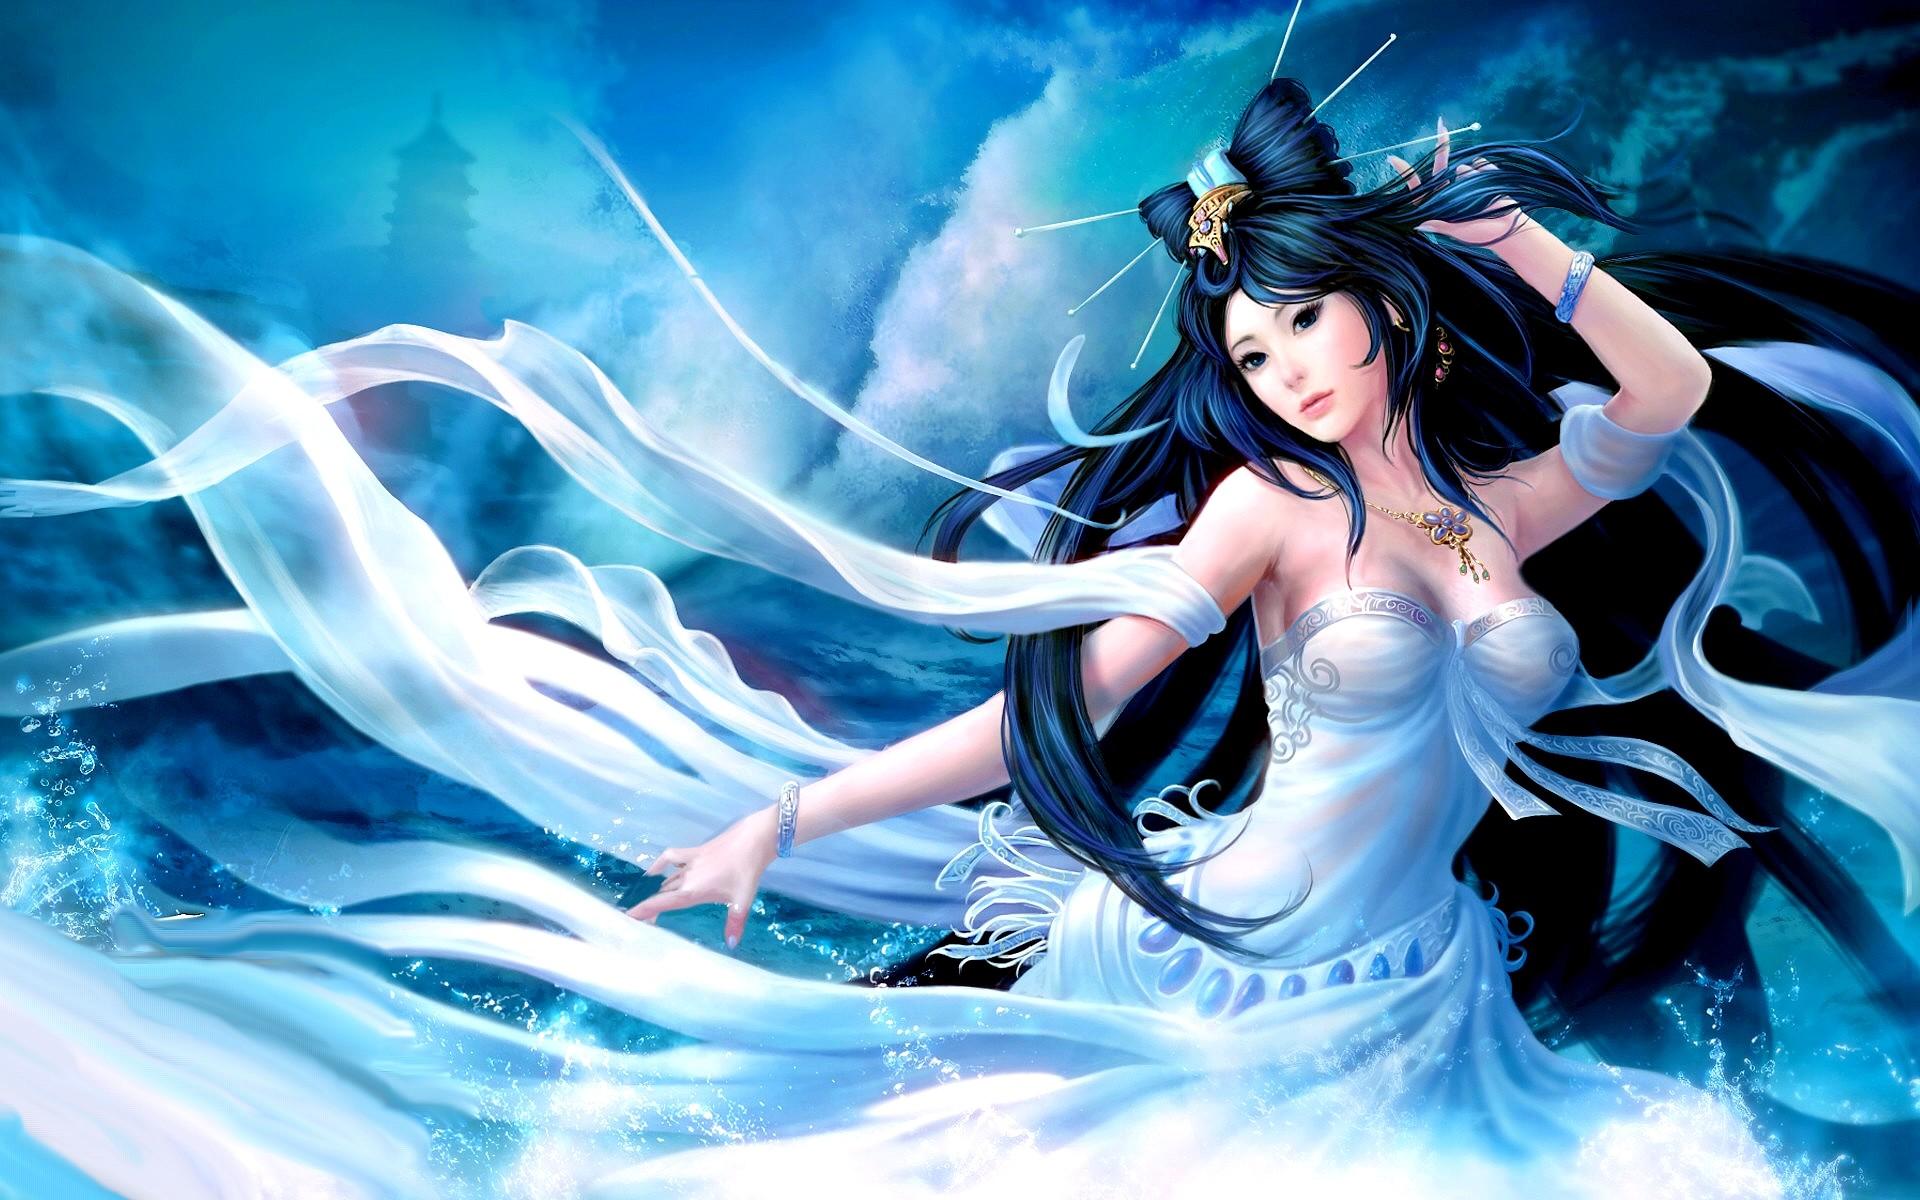 Fantasy princess wallpaper 78 images - Fantasy game wallpaper ...